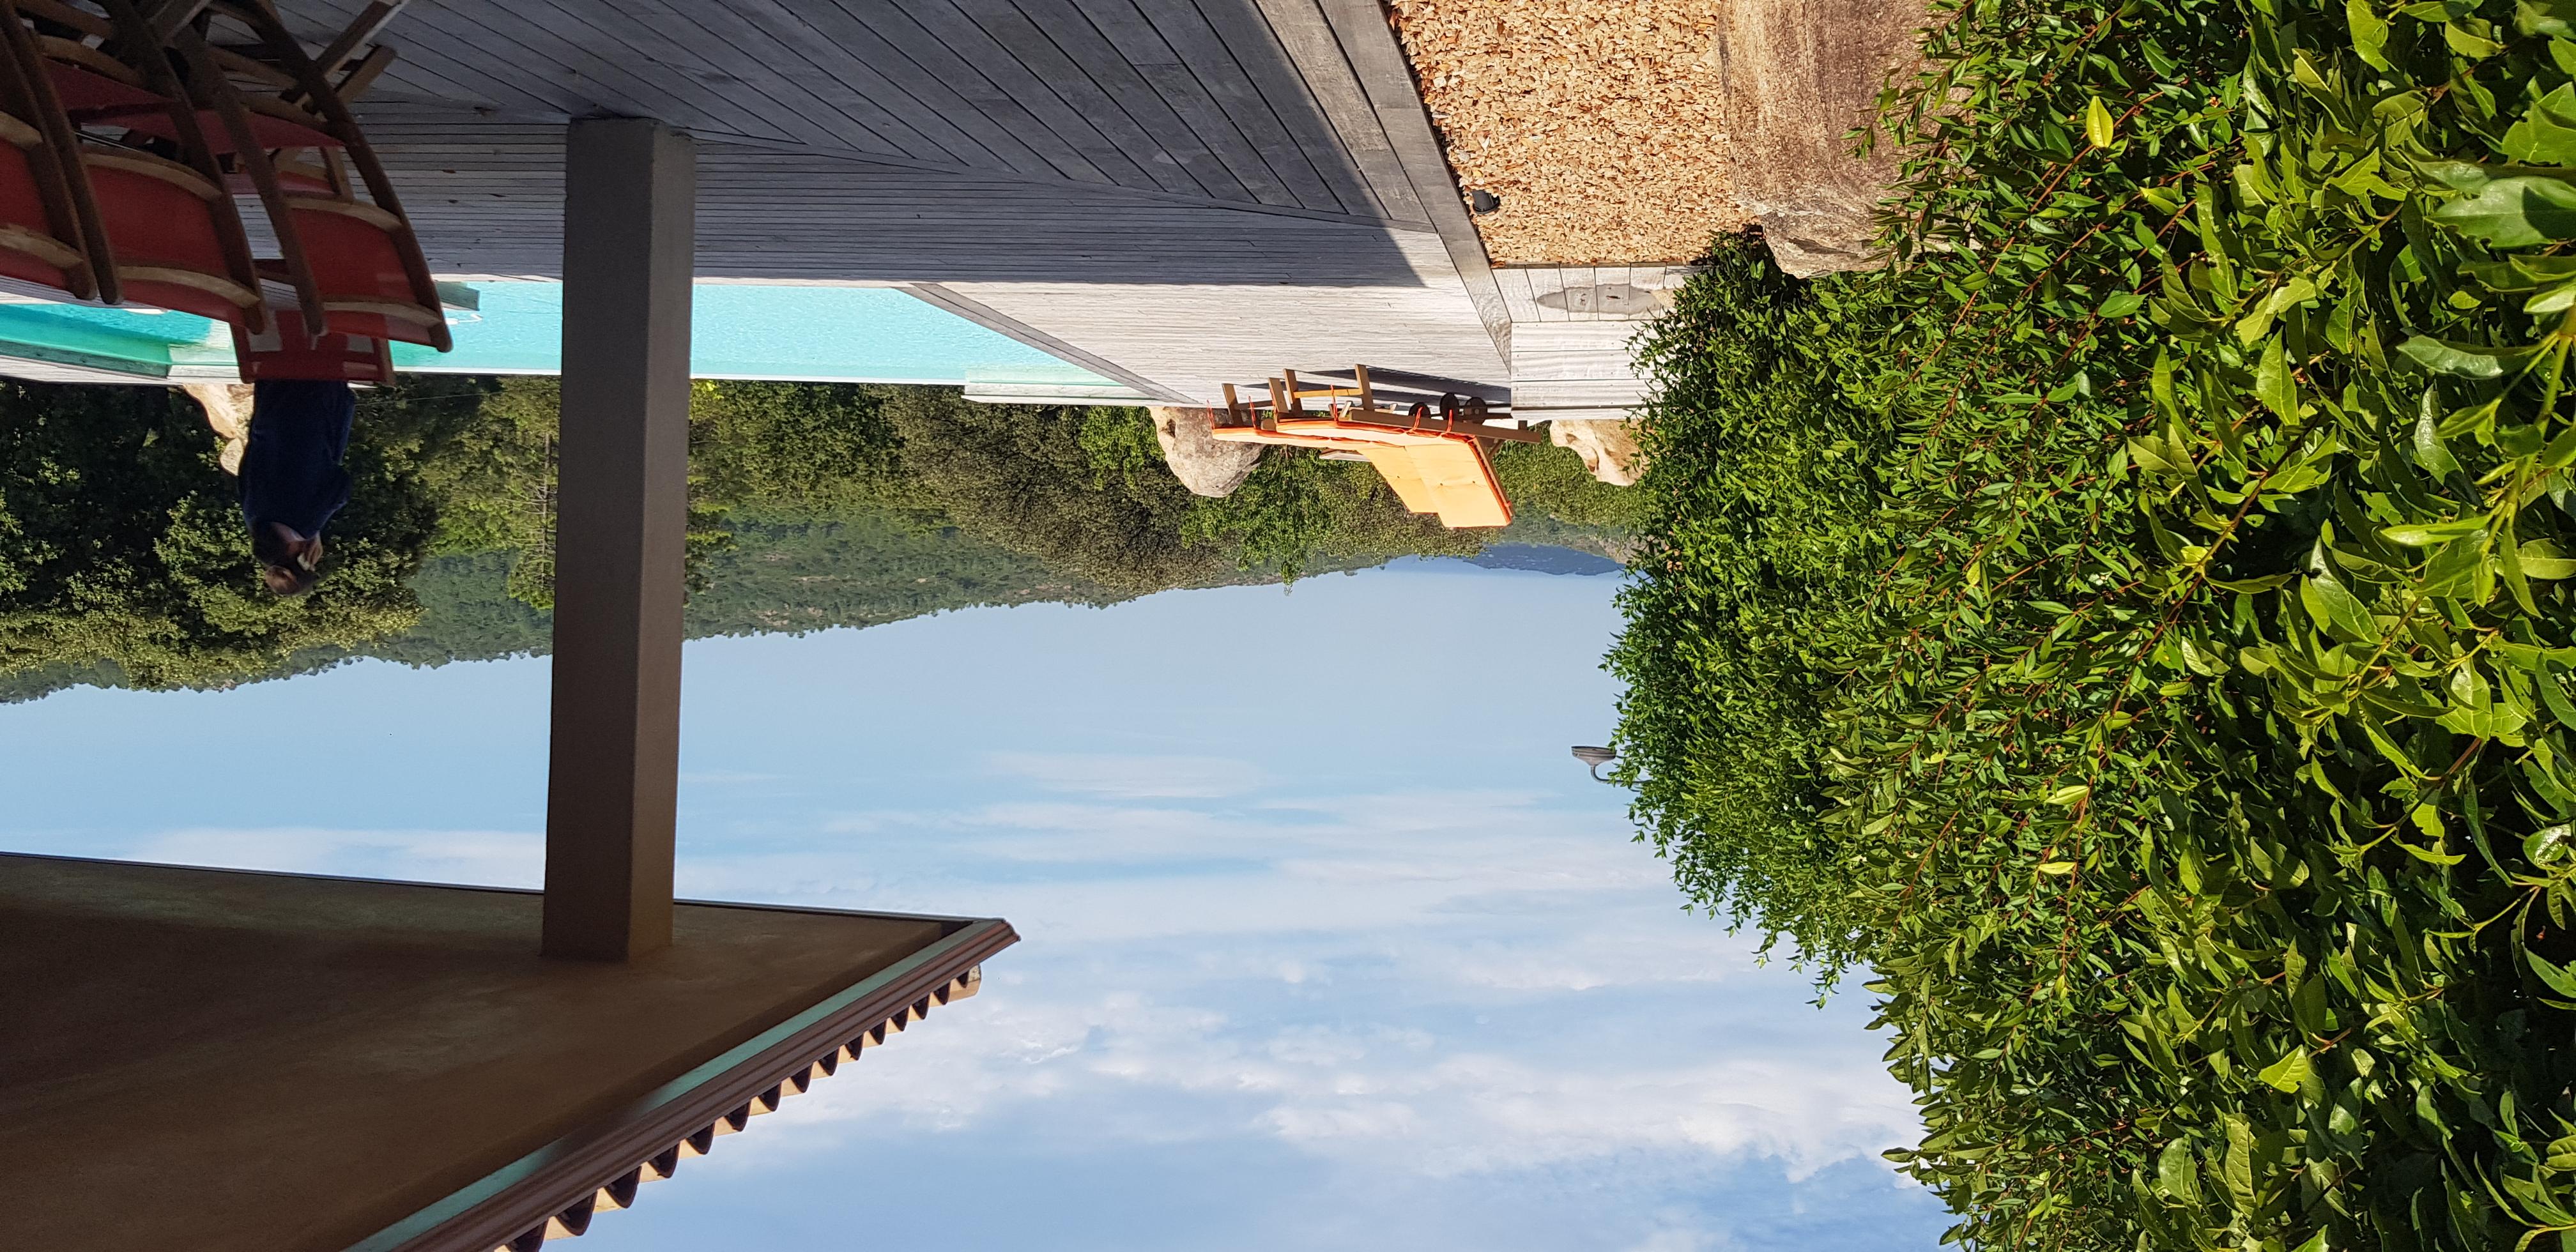 charmants Süd Korsika, Ferienhaus mieten mit Pool